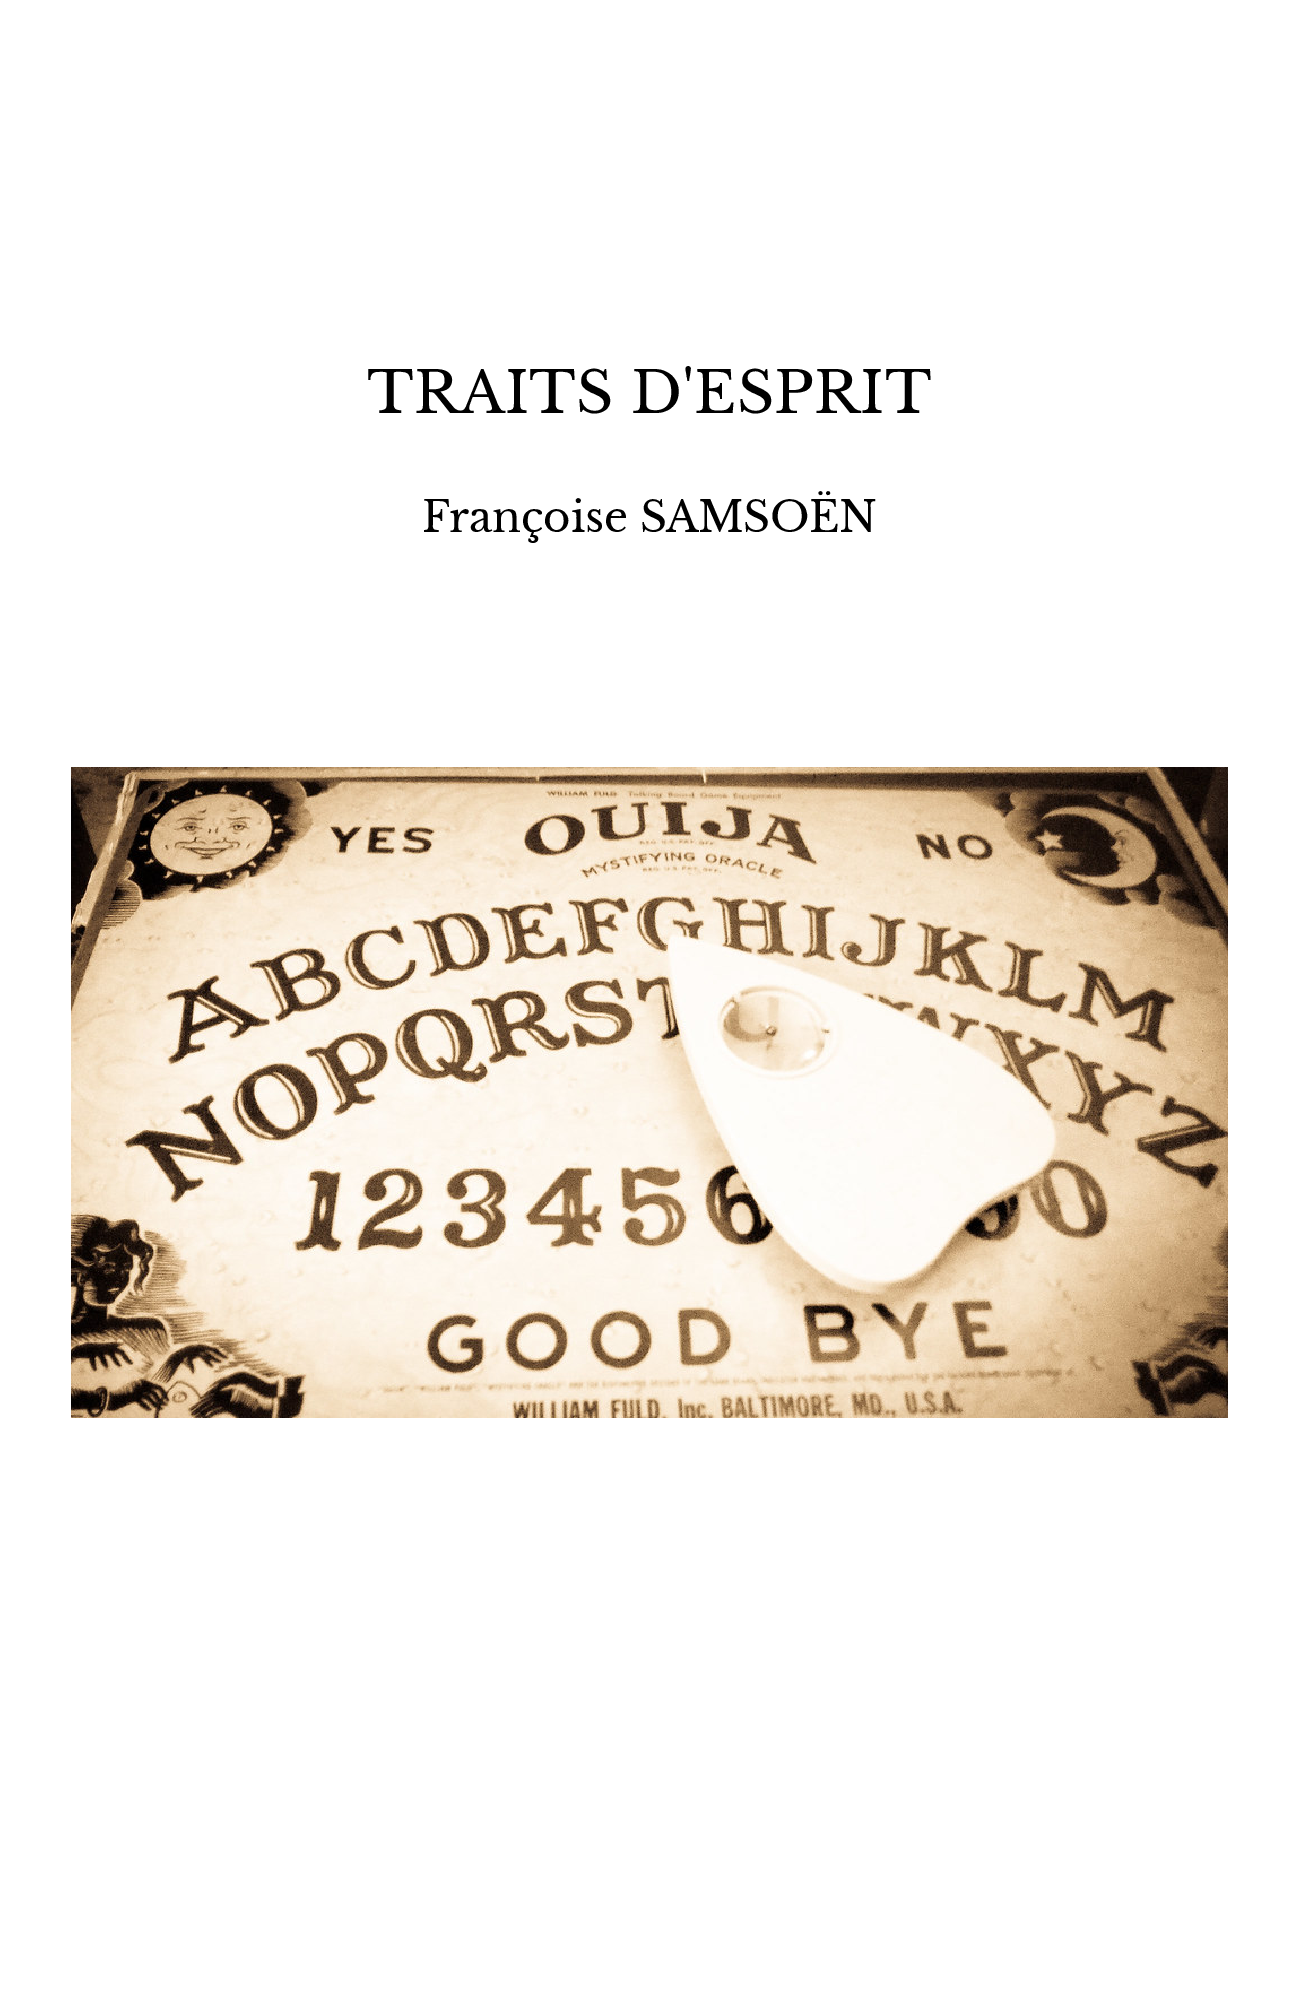 TRAITS D'ESPRIT